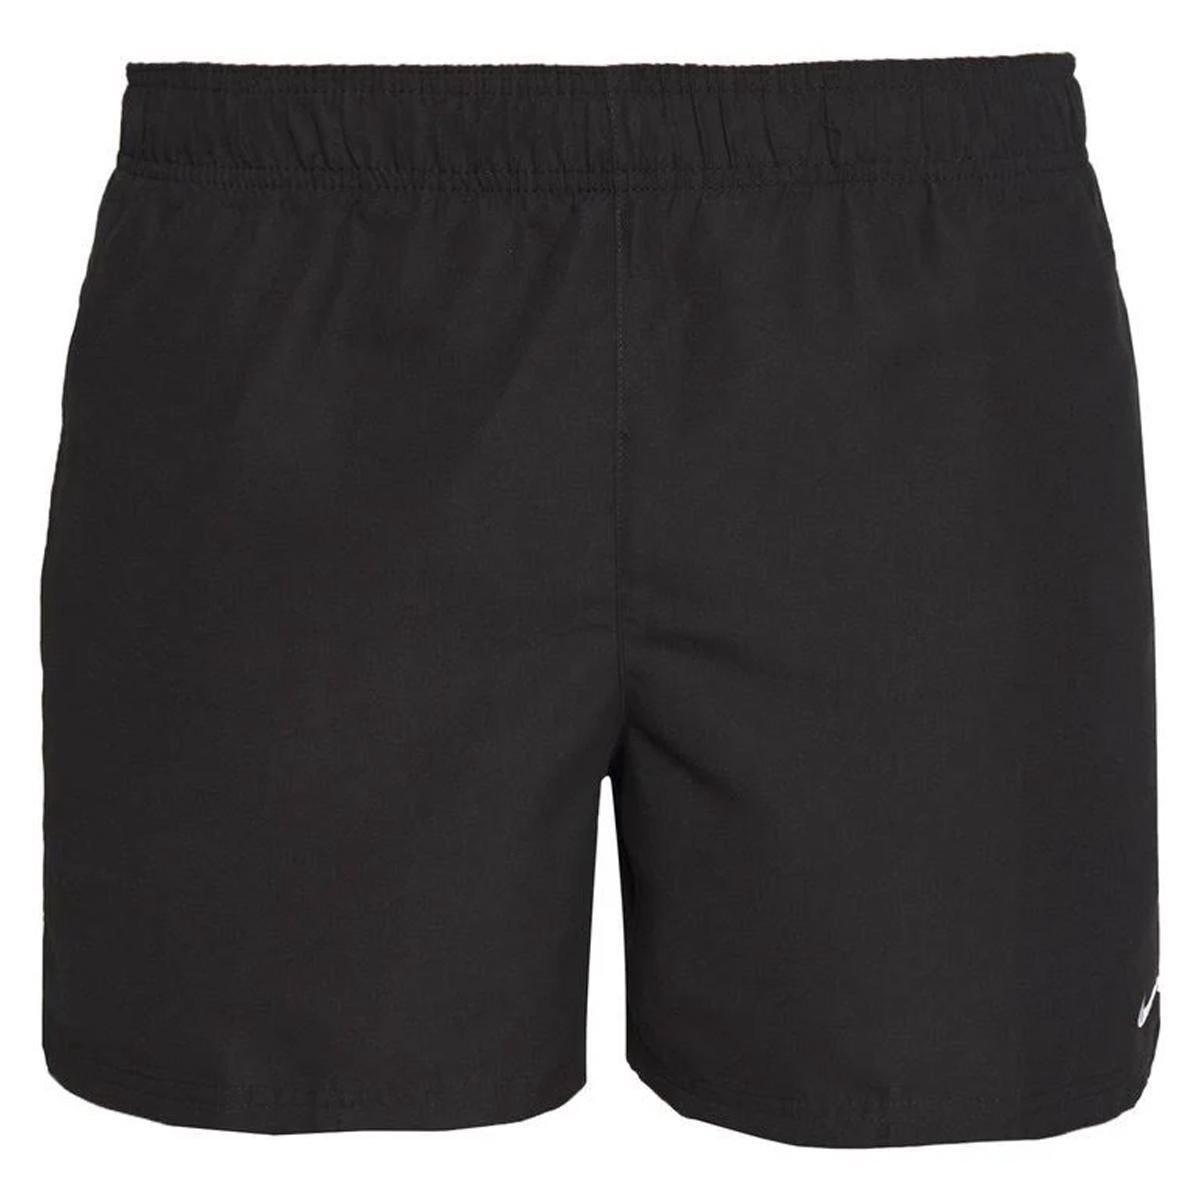 Nike Swim 5 VOLLEY SHORT Zwembroek - Zwart - Mannen - Maat M